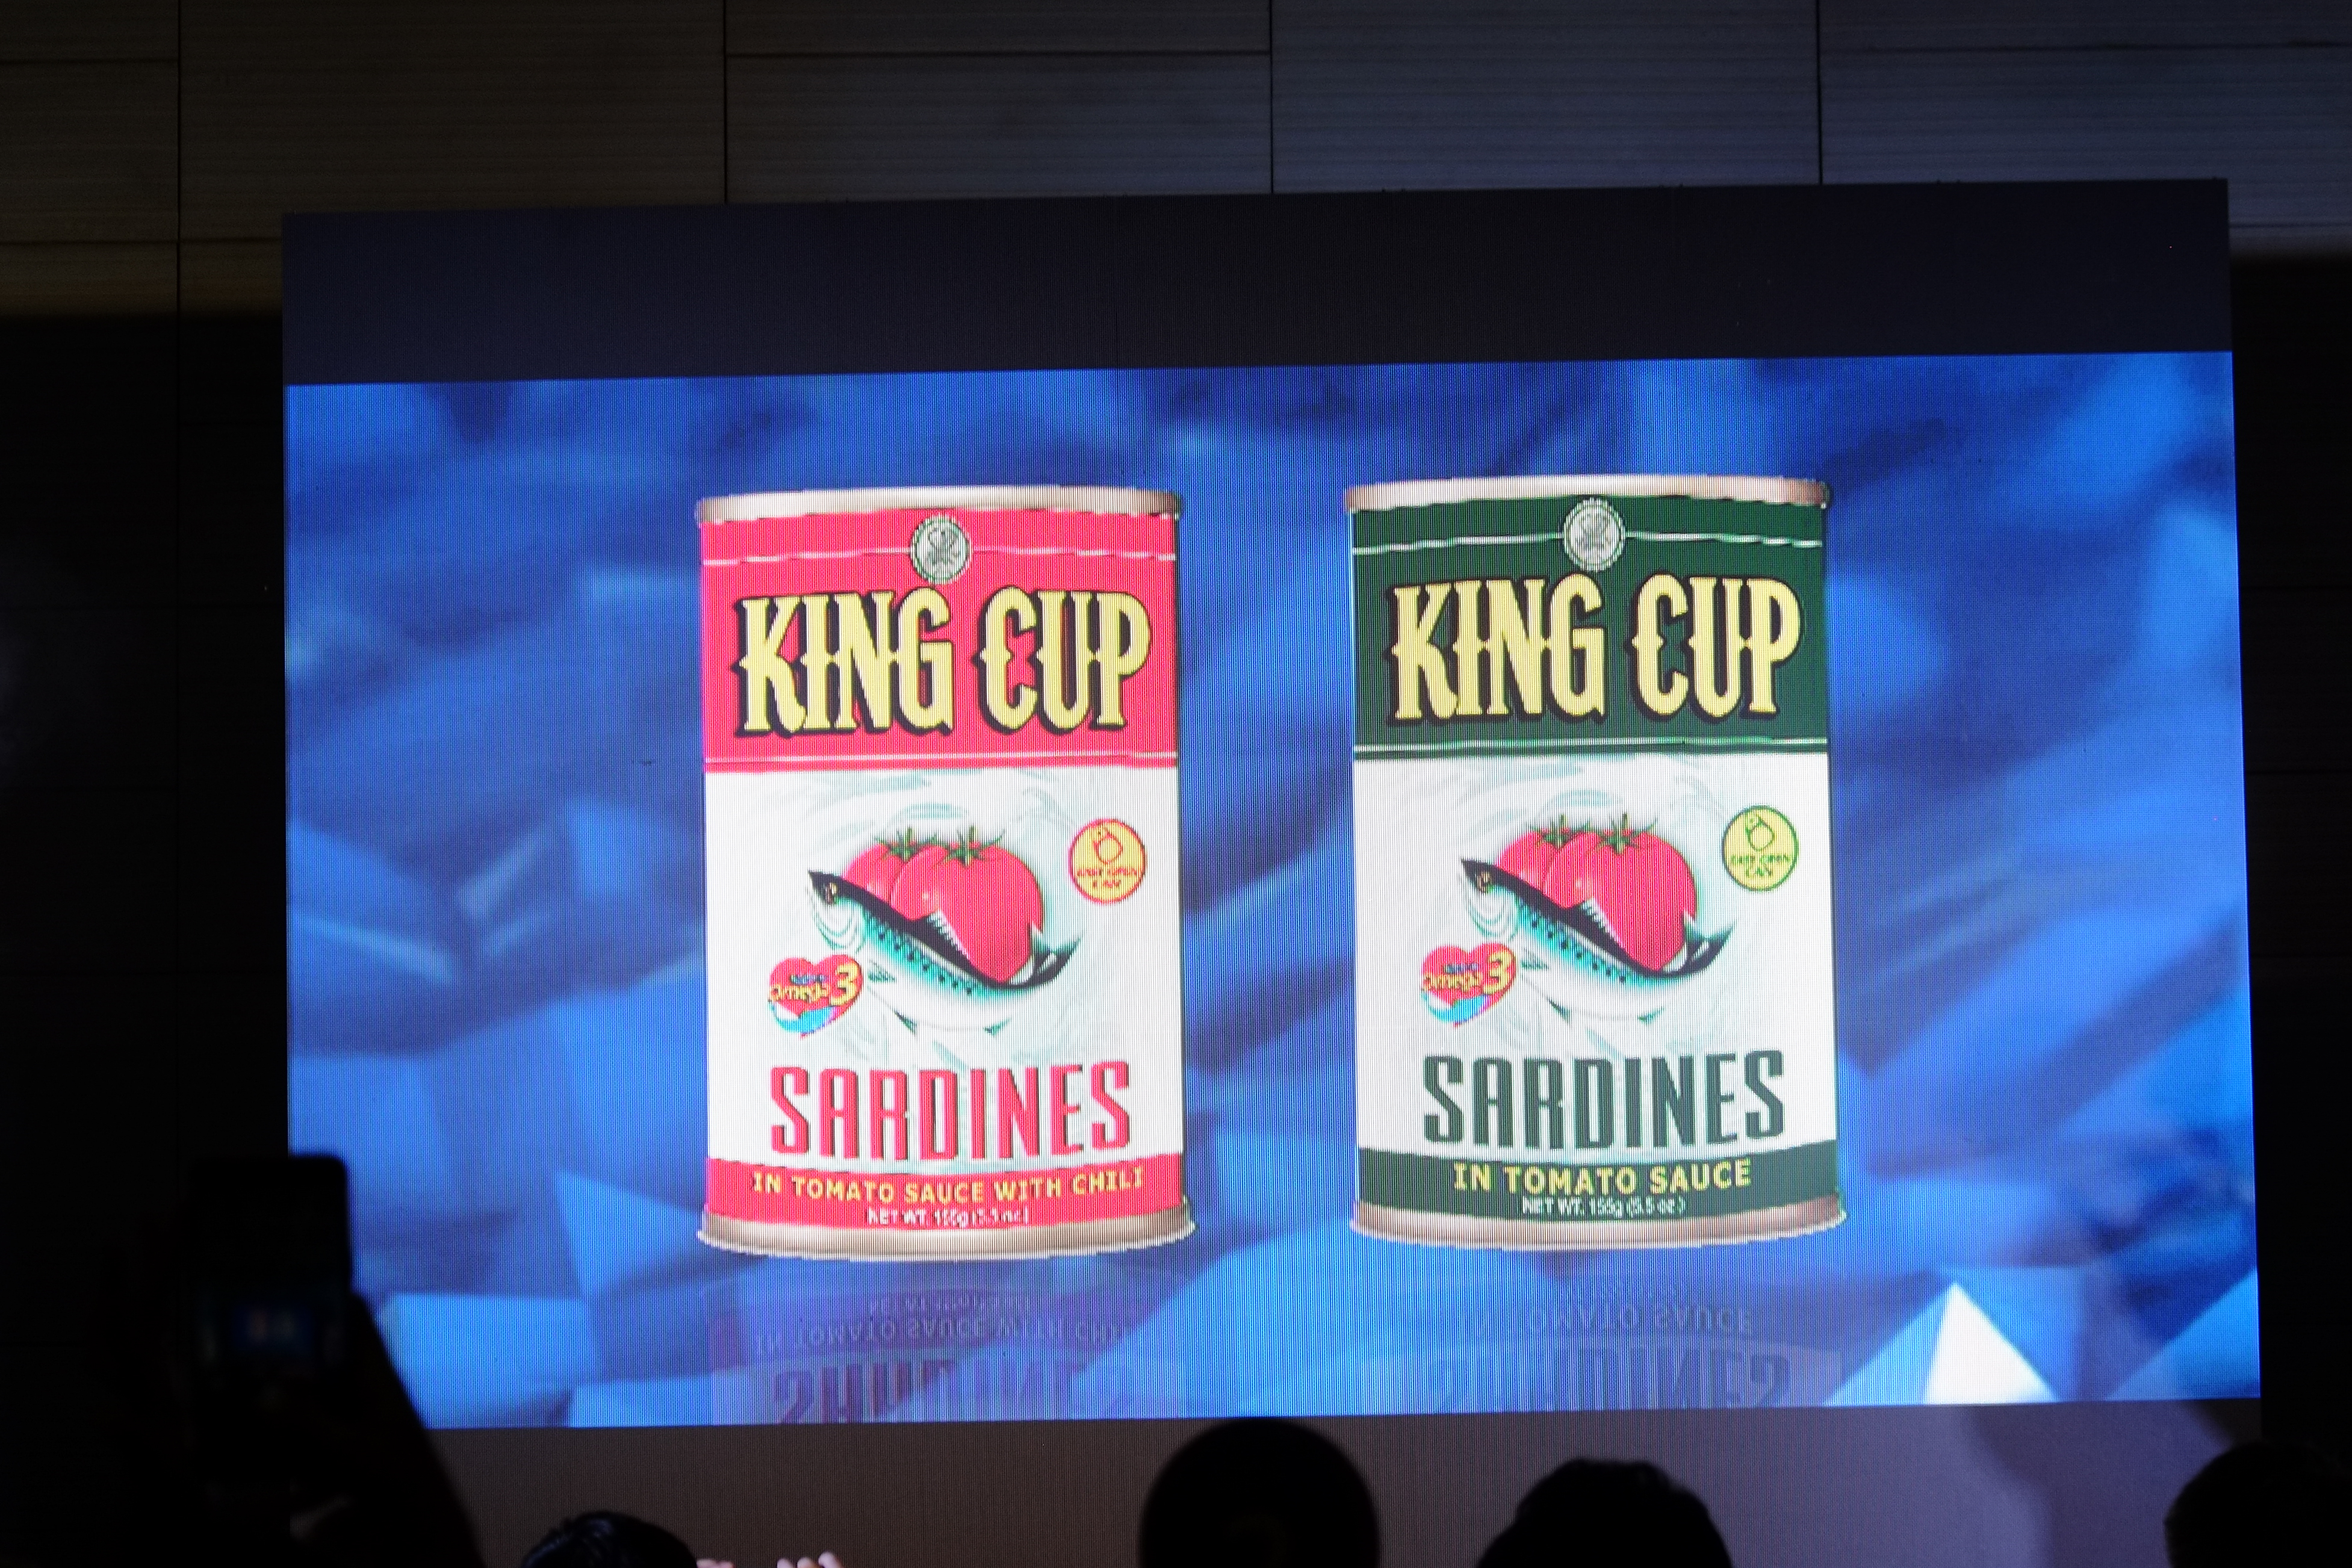 king cup sardines and coco martin joy gurtiza